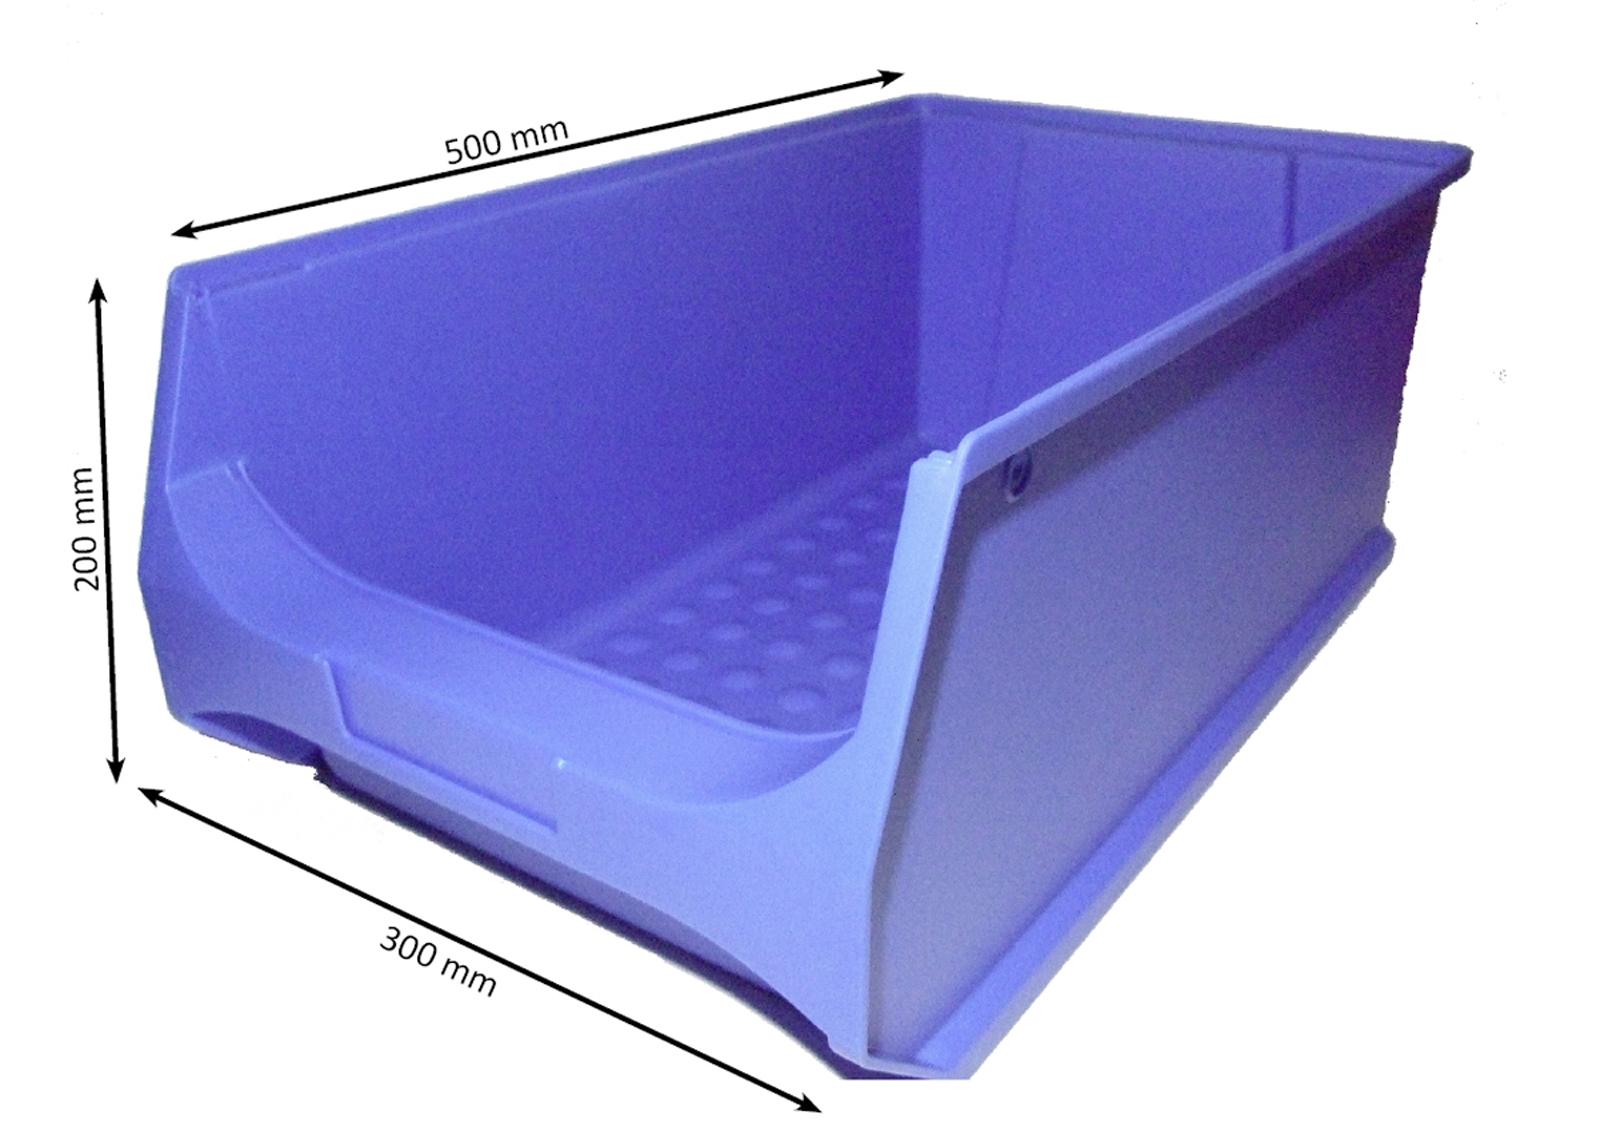 3 10 St/ück Stapelboxen stapelbar//Sichtbox//Regalbox//Lagerbox blau